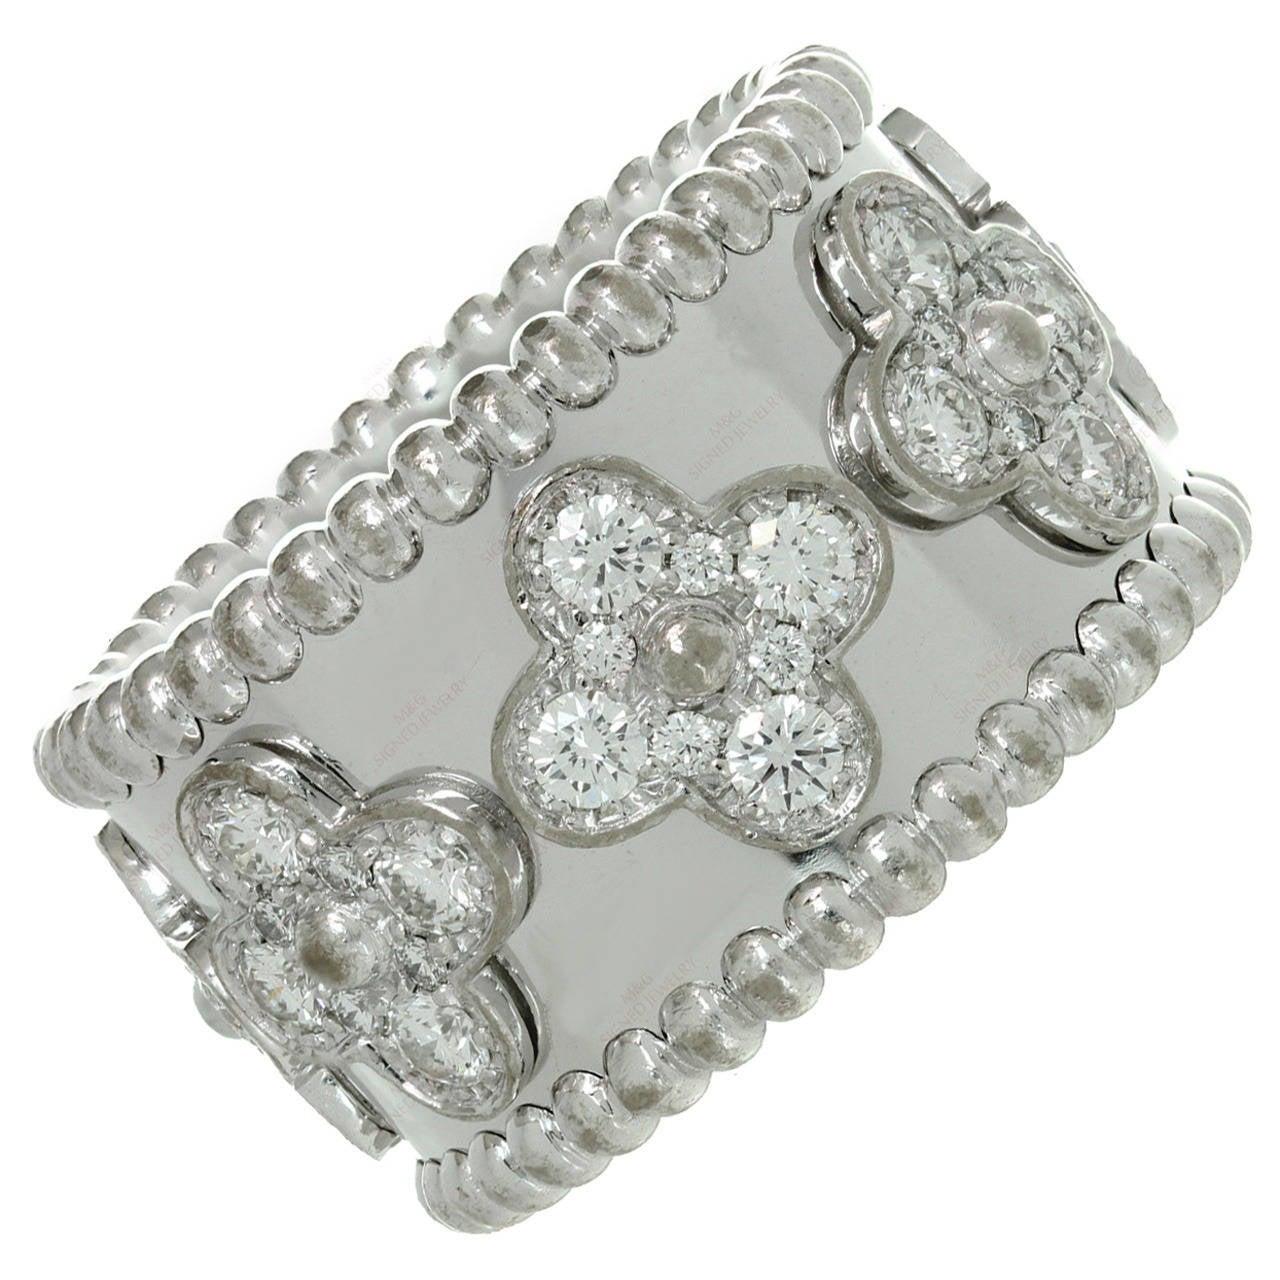 Van Cleef & Arpels Perlee Clover Diamond Gold Band Ring 1